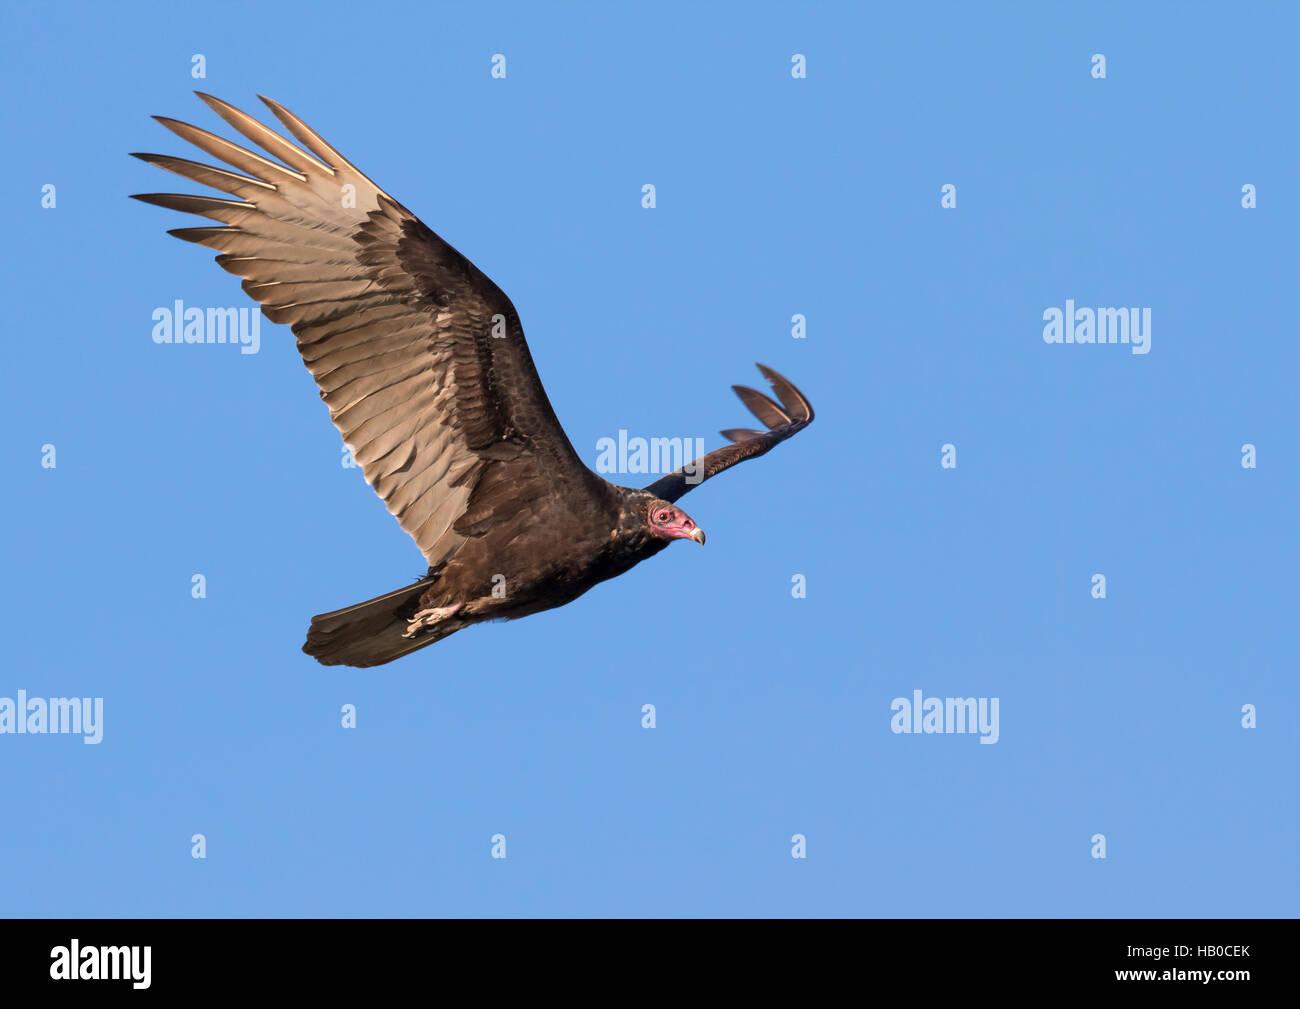 Turkey vulture (Cathartes aura) flying, Aransas, Texas, USA. - Stock Image